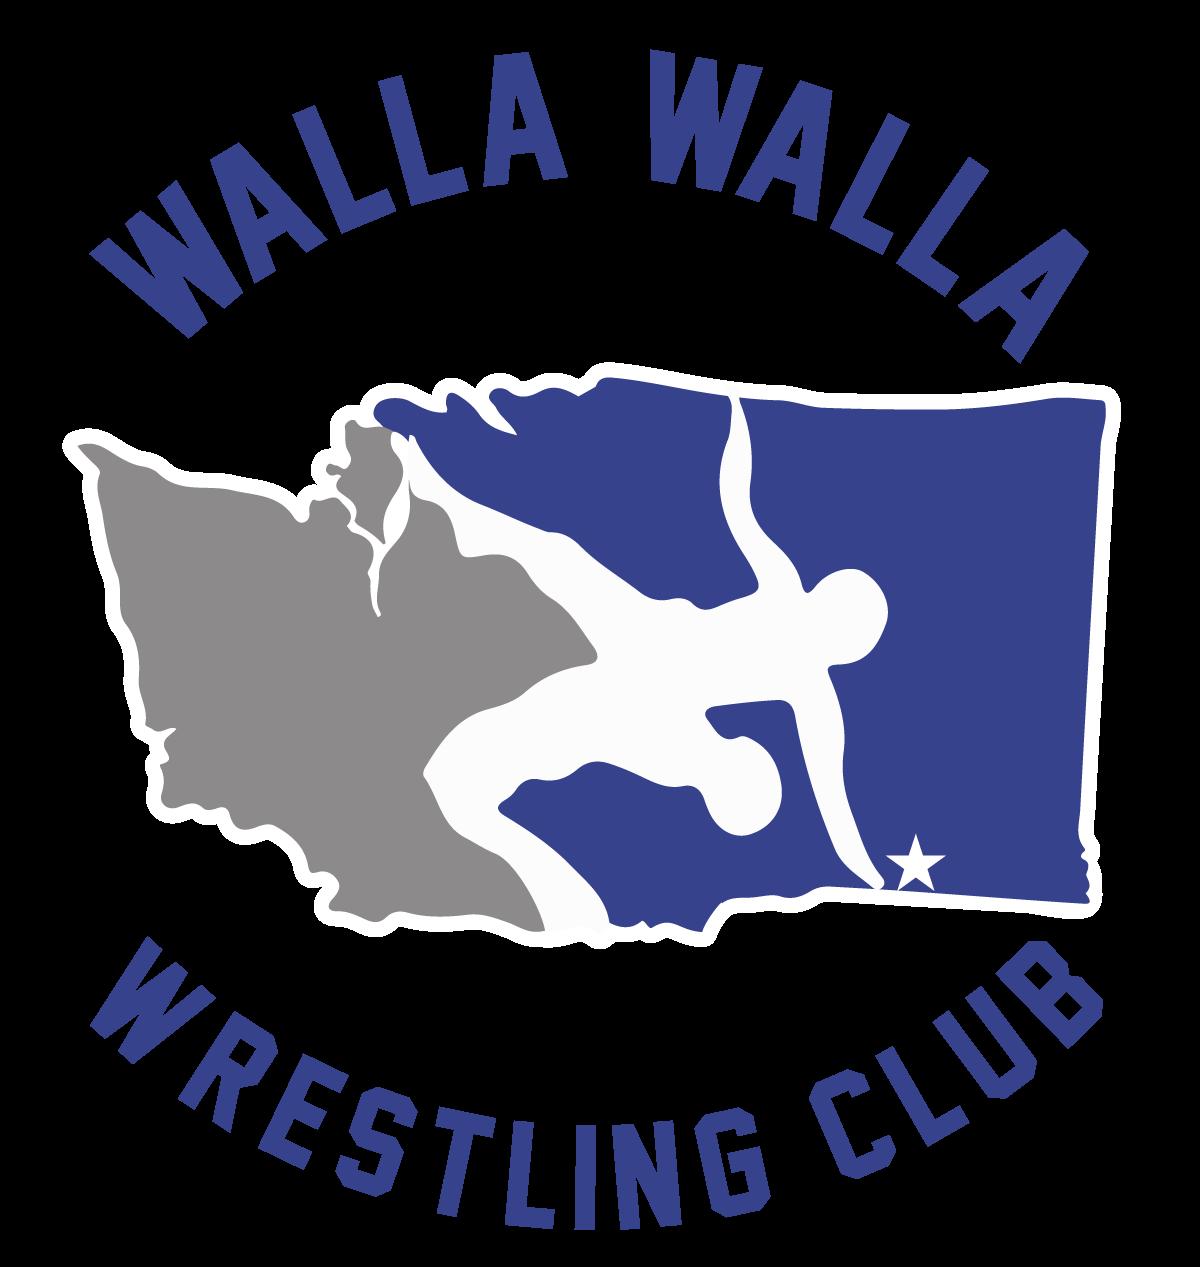 Walla walla logo2 %282%29